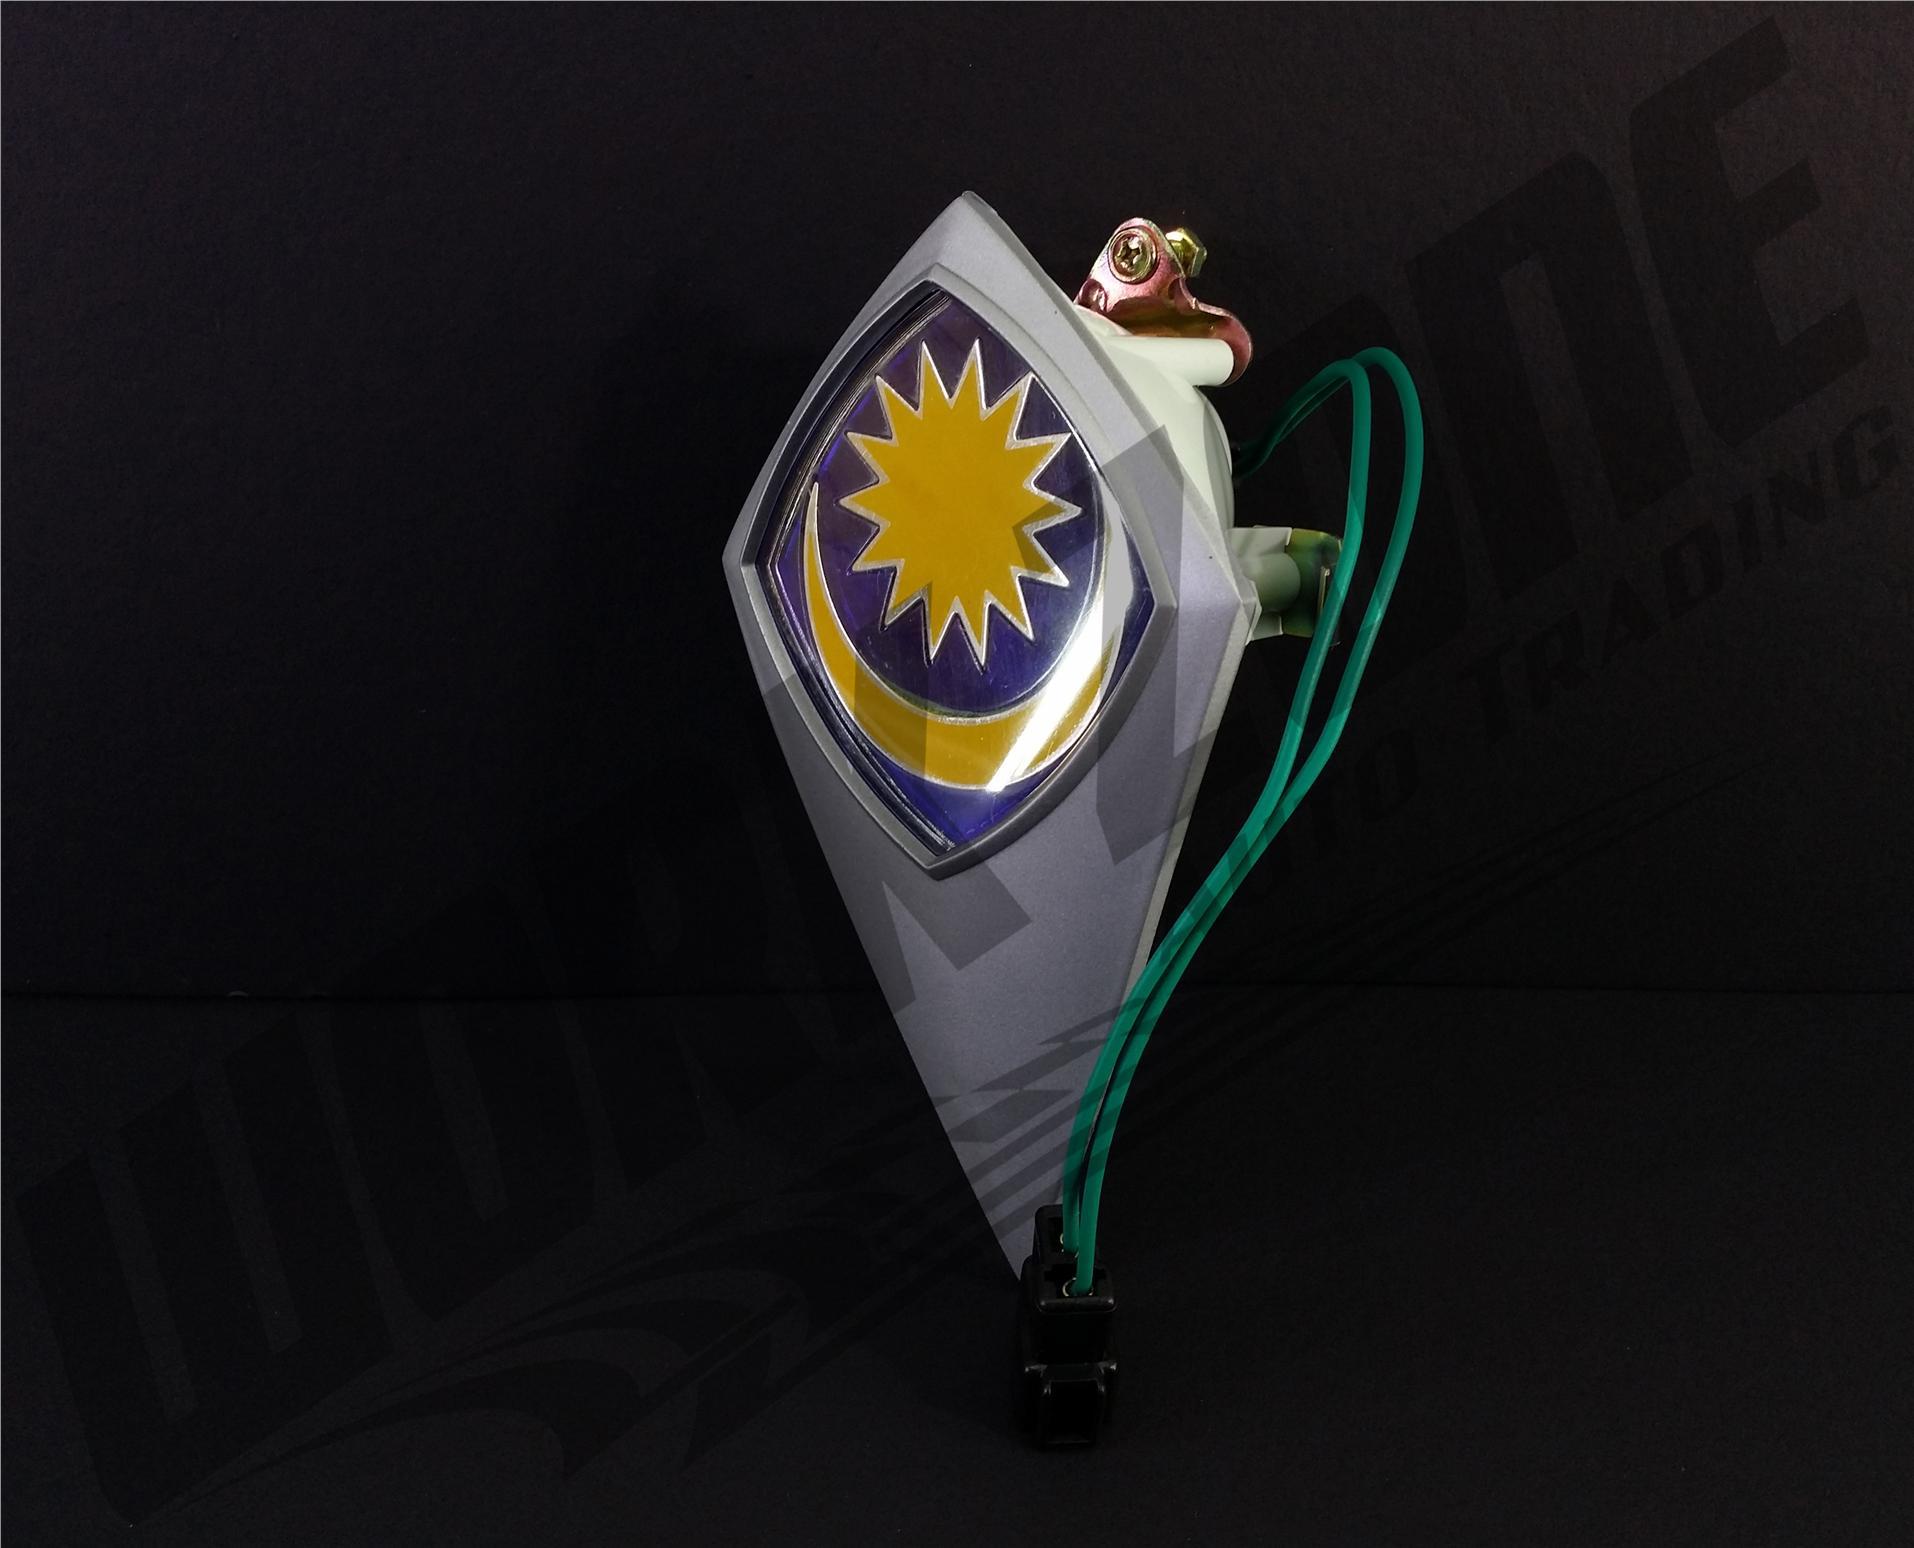 proton saga 12v front emblem logo end 12 24 2020 12 00 am